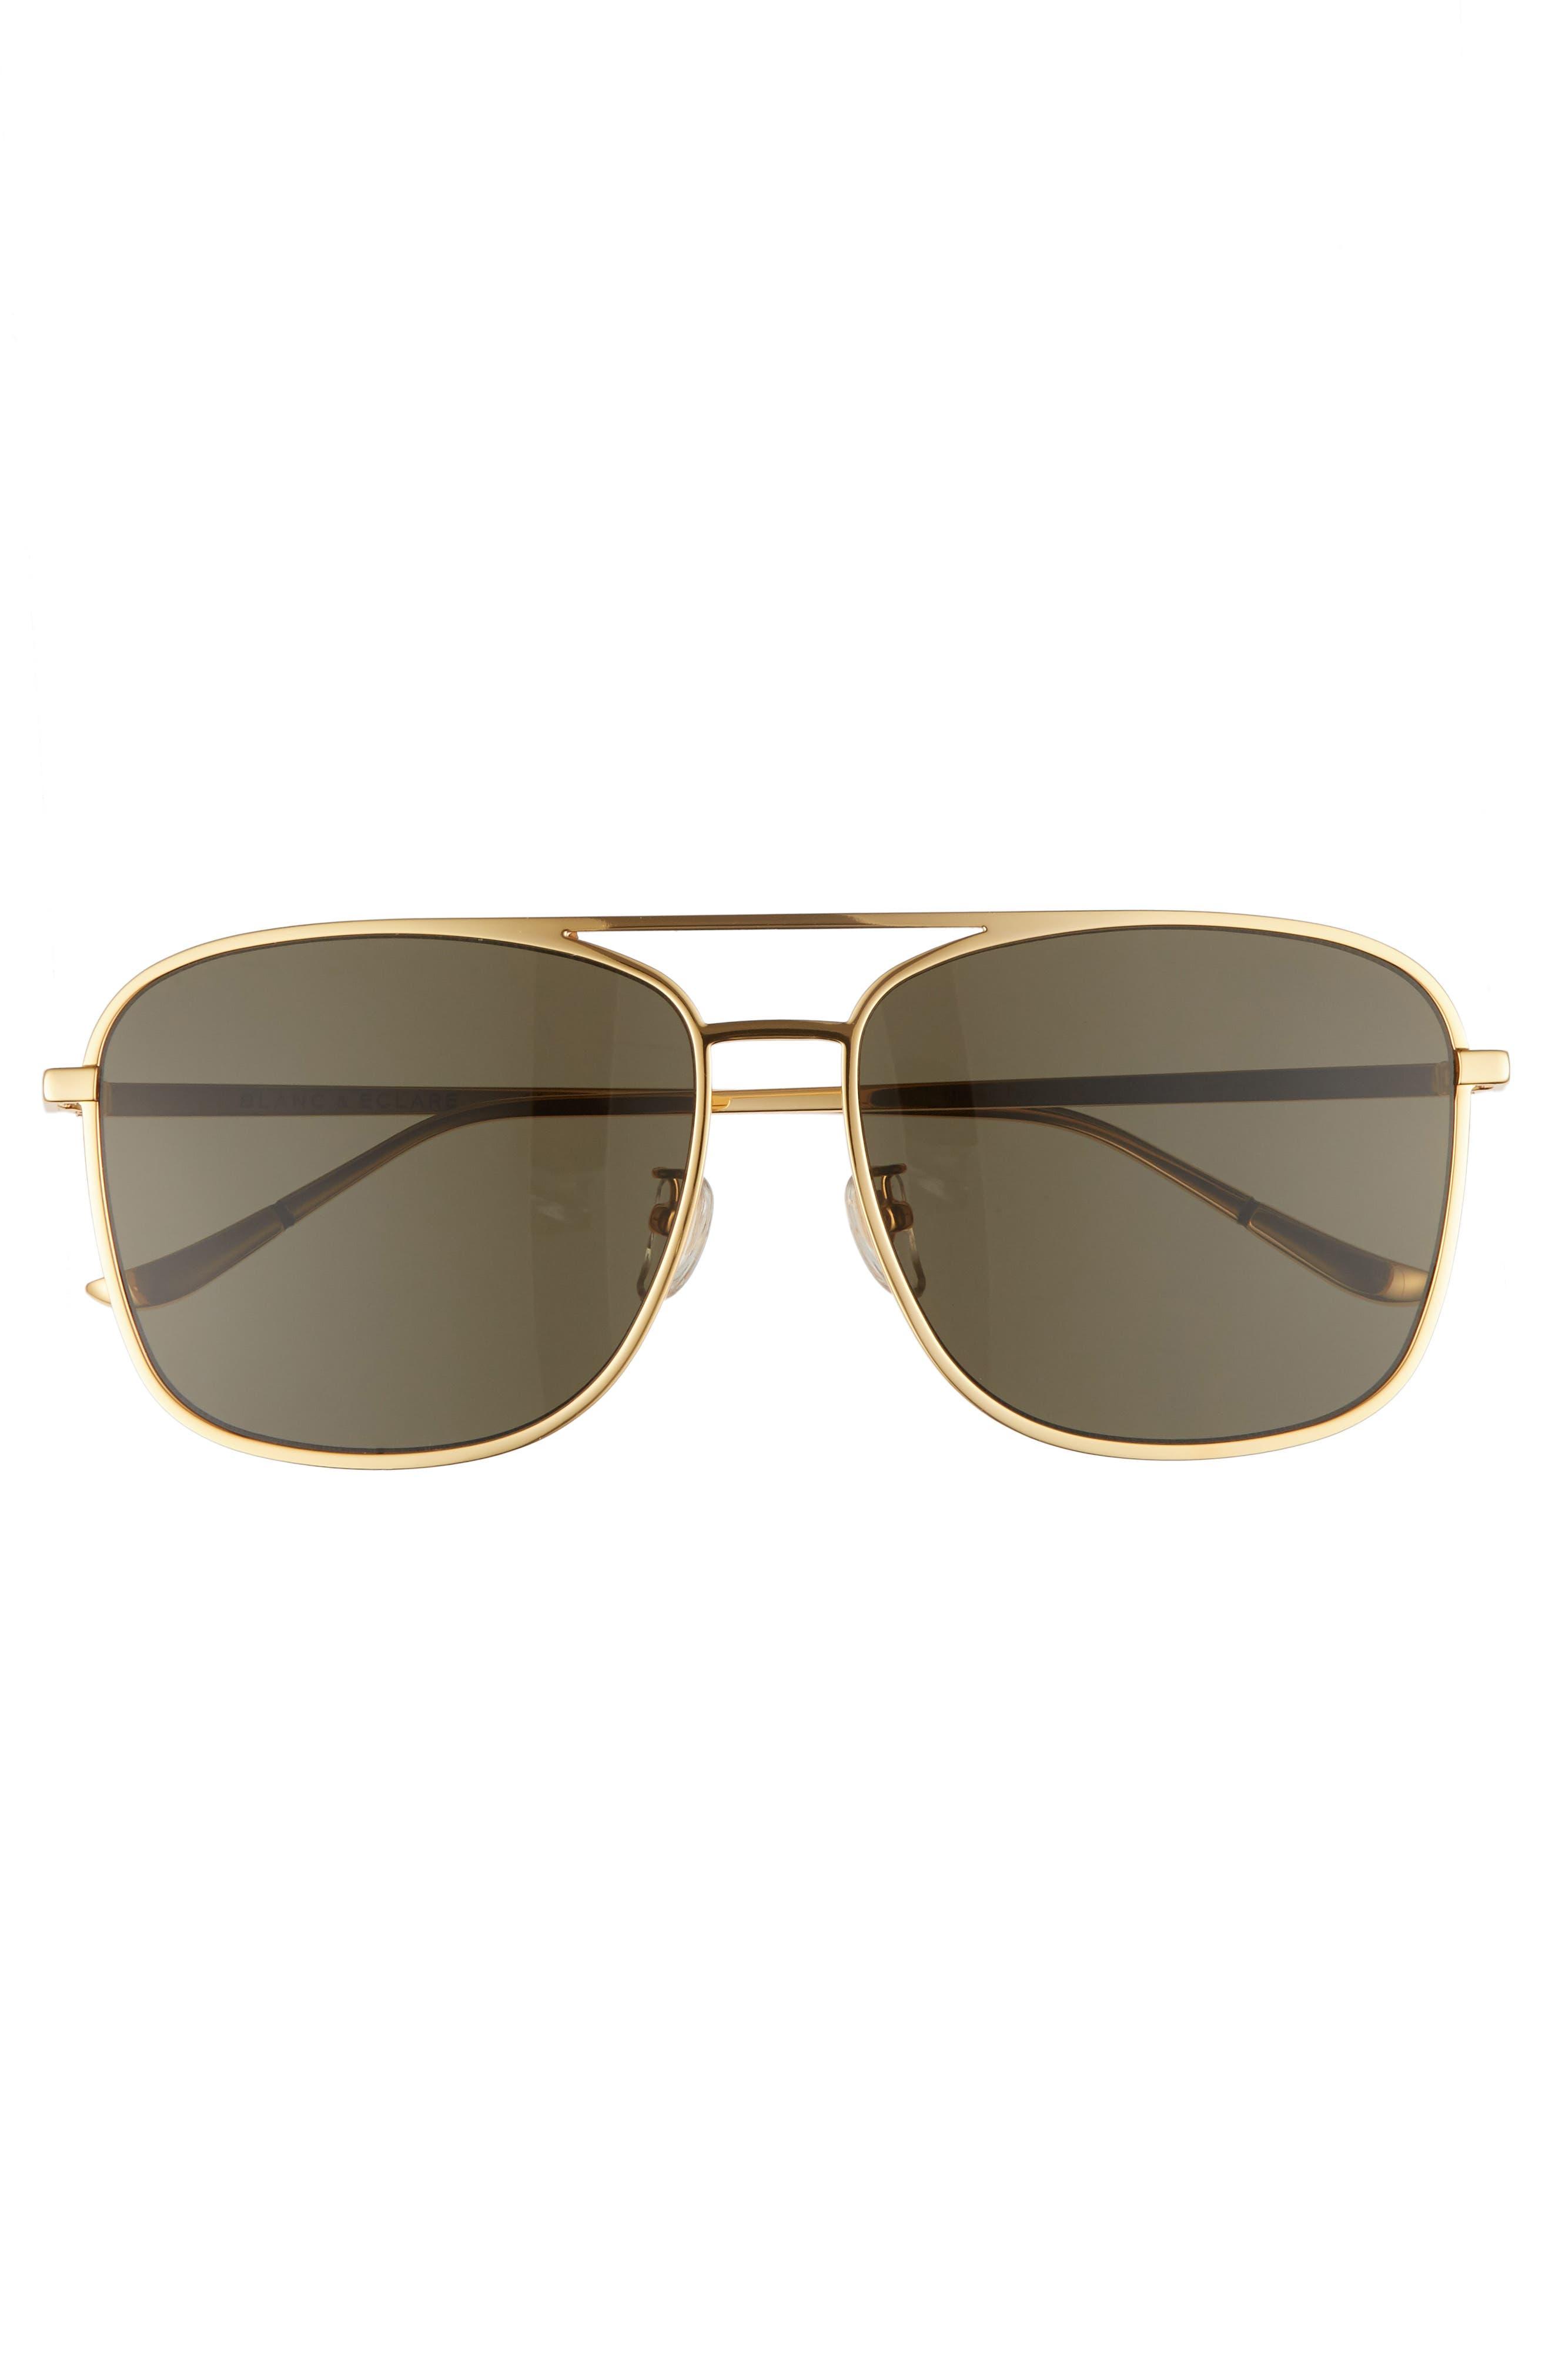 BLANC & ECLARE Geneva Large 60mm Polarized Metal Aviator Sunglasses,                             Alternate thumbnail 6, color,